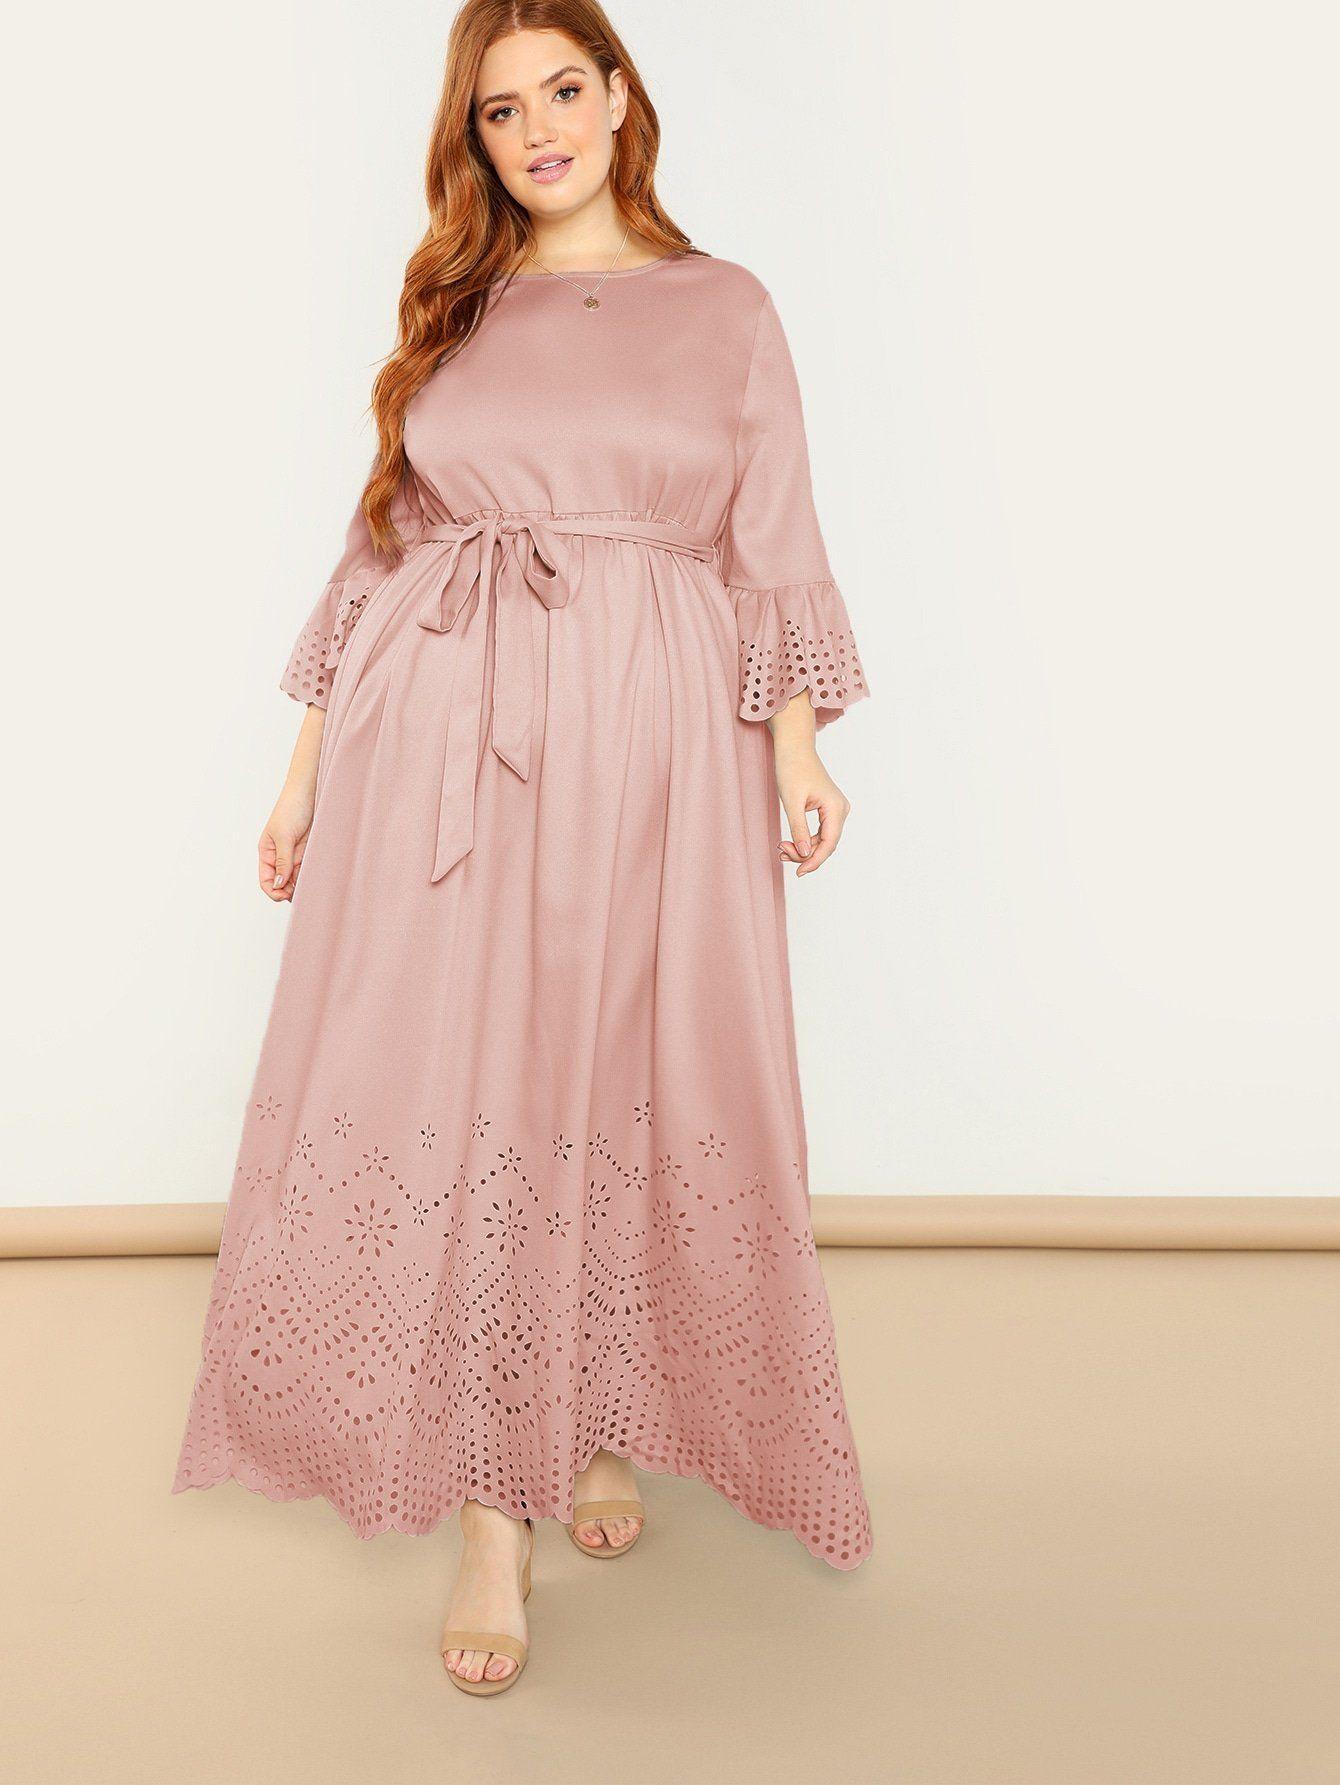 SHEINPlus V Neck Scallop Trim Laser Cut Solid Dress - Pink / 0XL